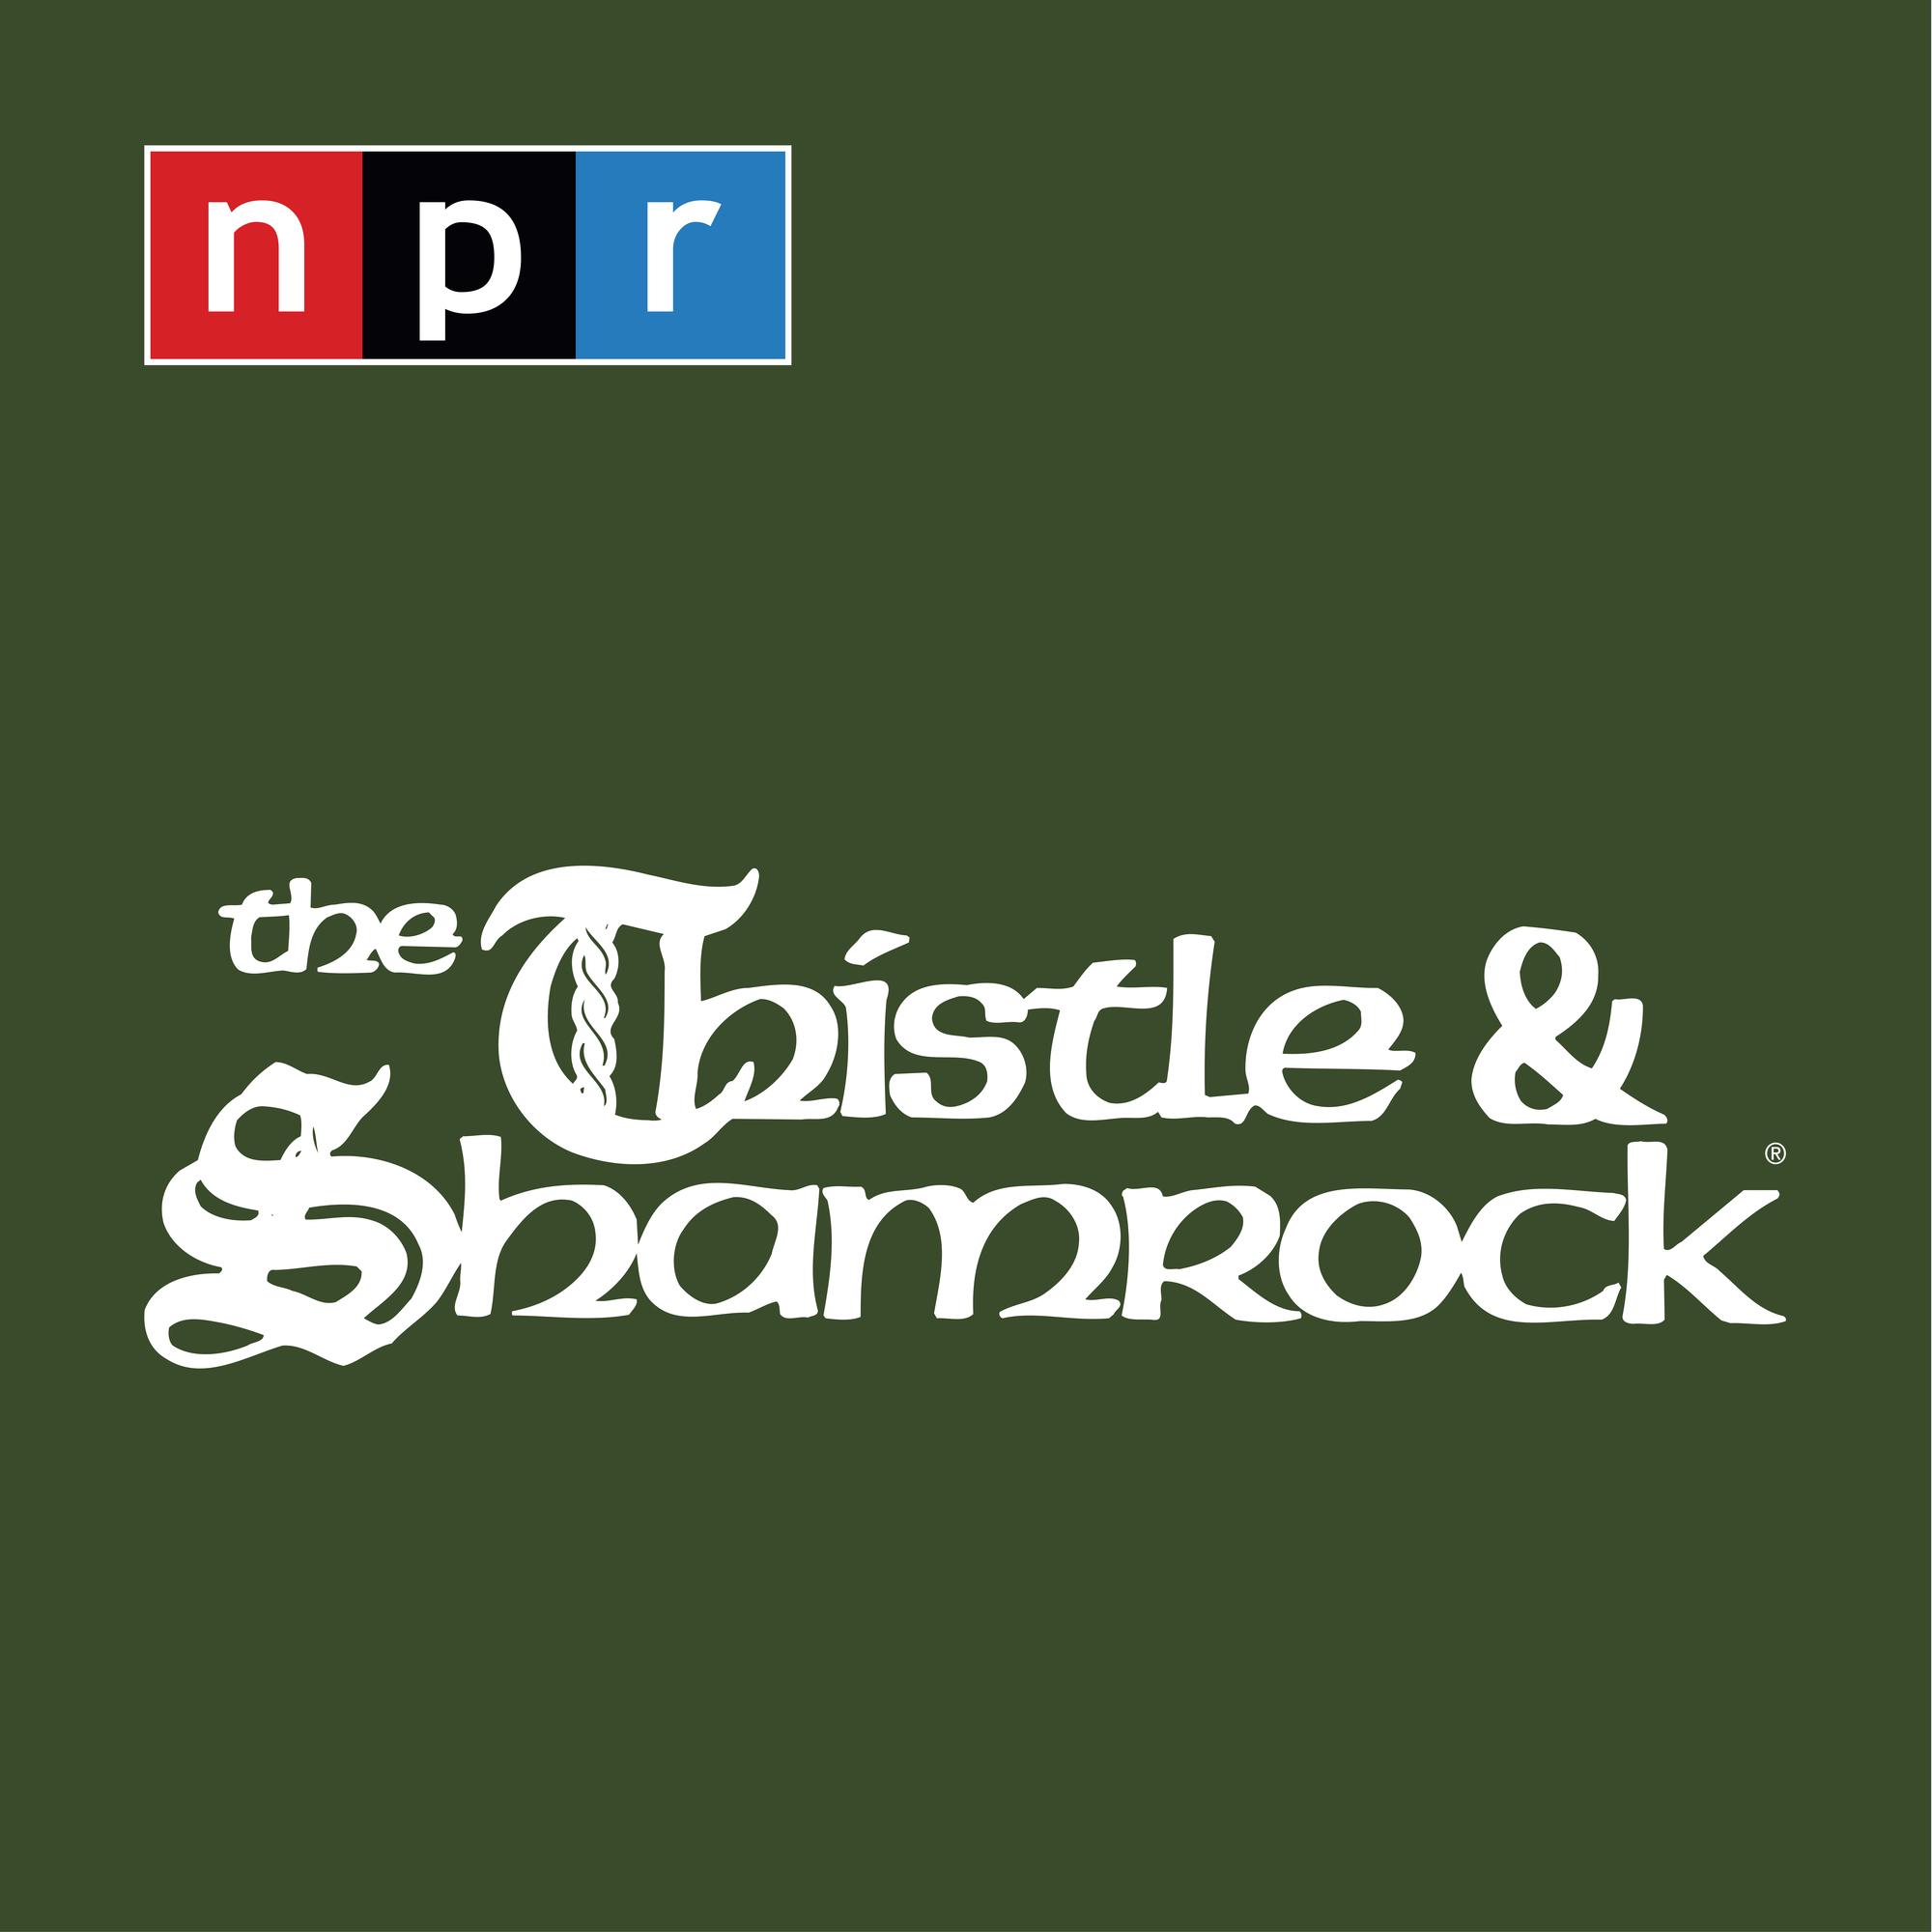 Thistle__NPR_logo.jpg